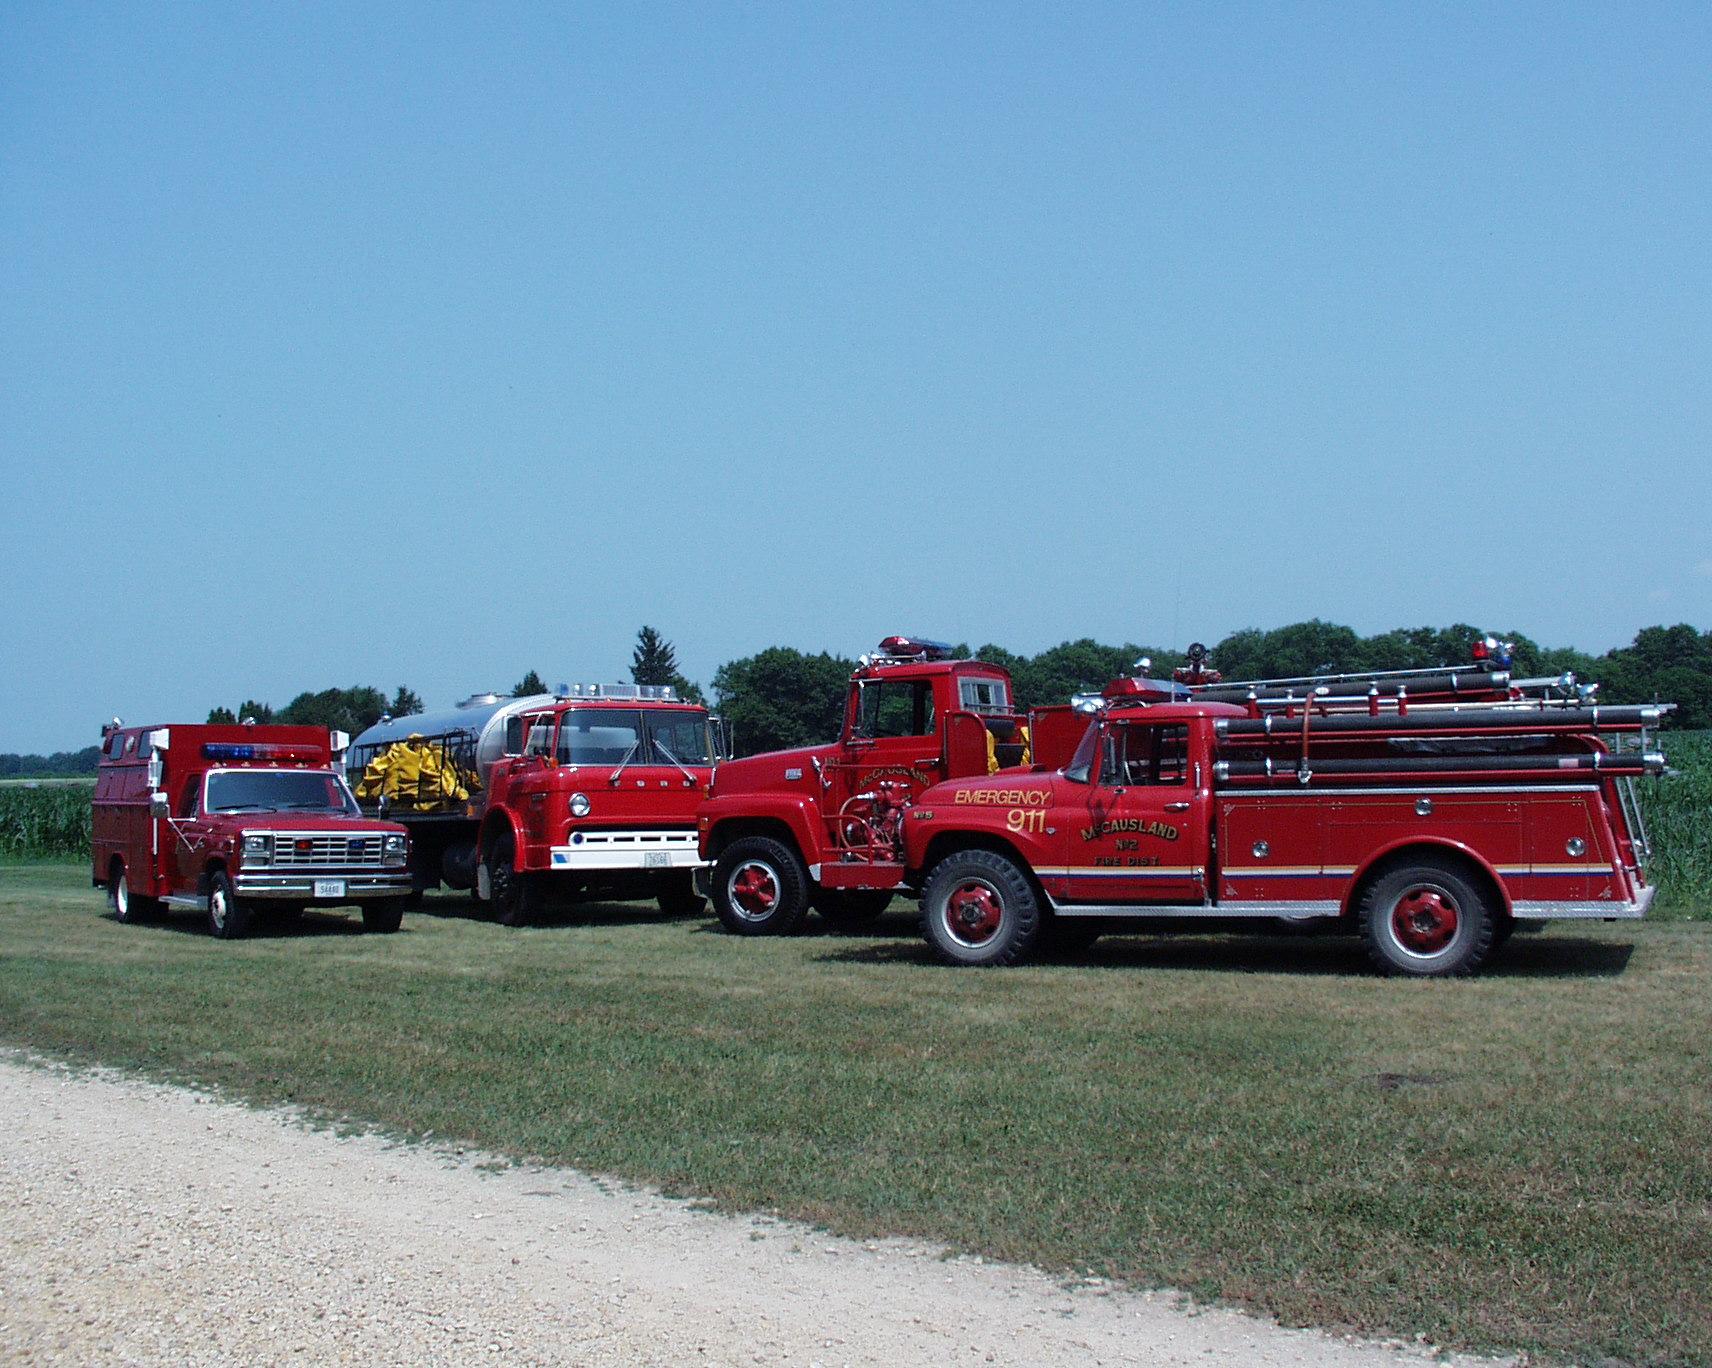 Mccausland fire department scott county iowa mccausland fire department fire trucks publicscrutiny Images